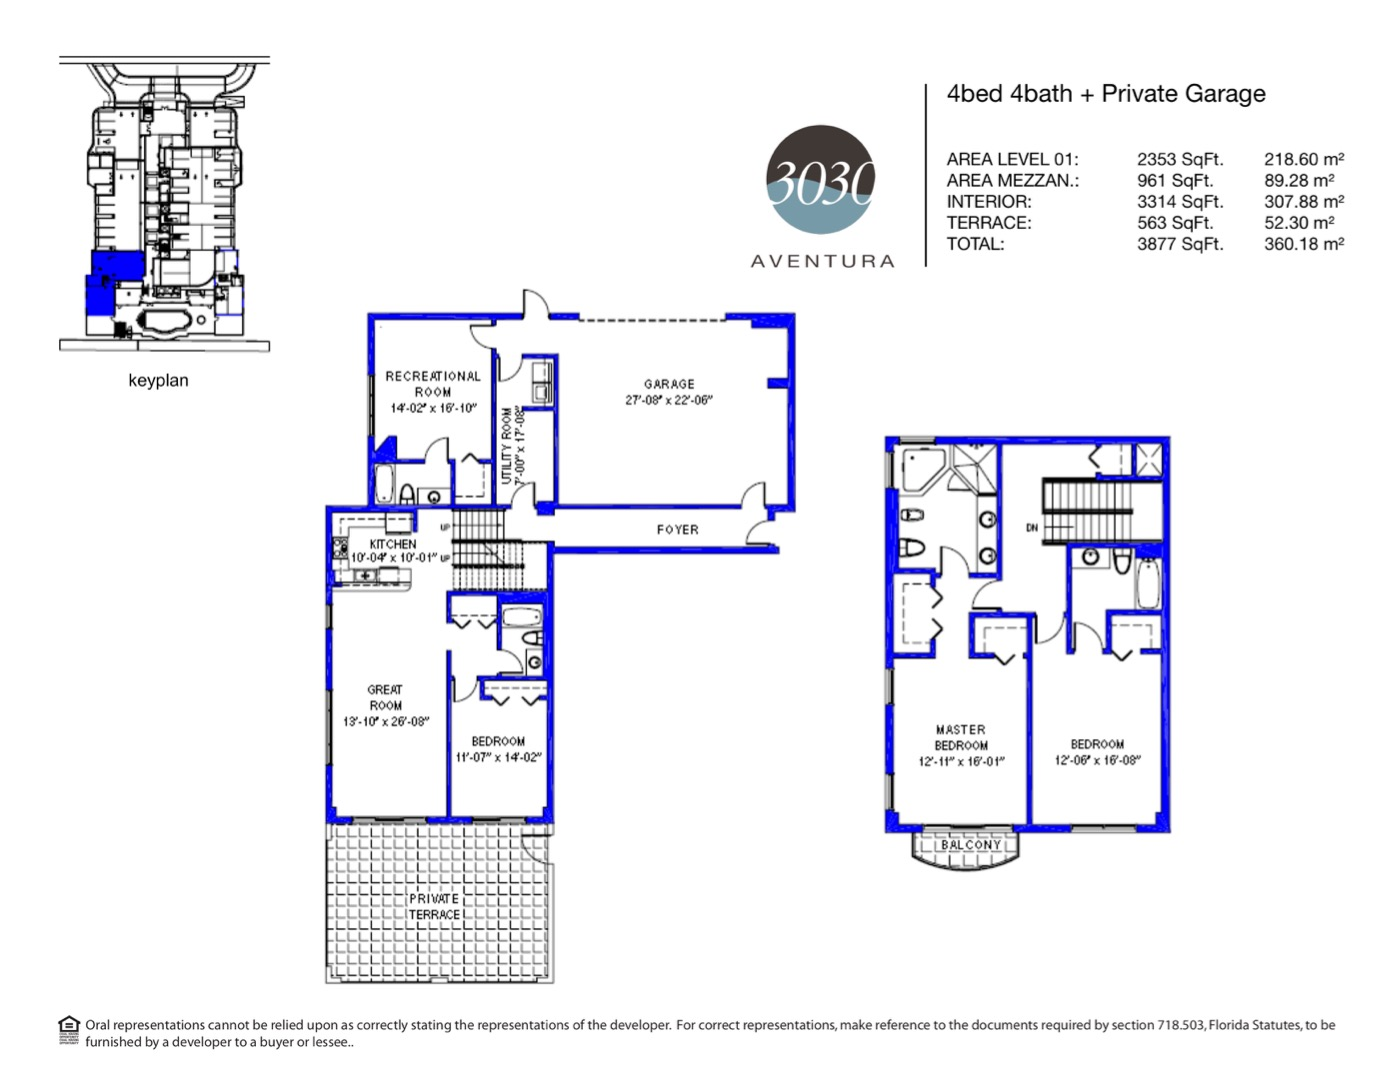 Floor plan image 11 - 4/4 + Private Garage  - 3877 sqft image